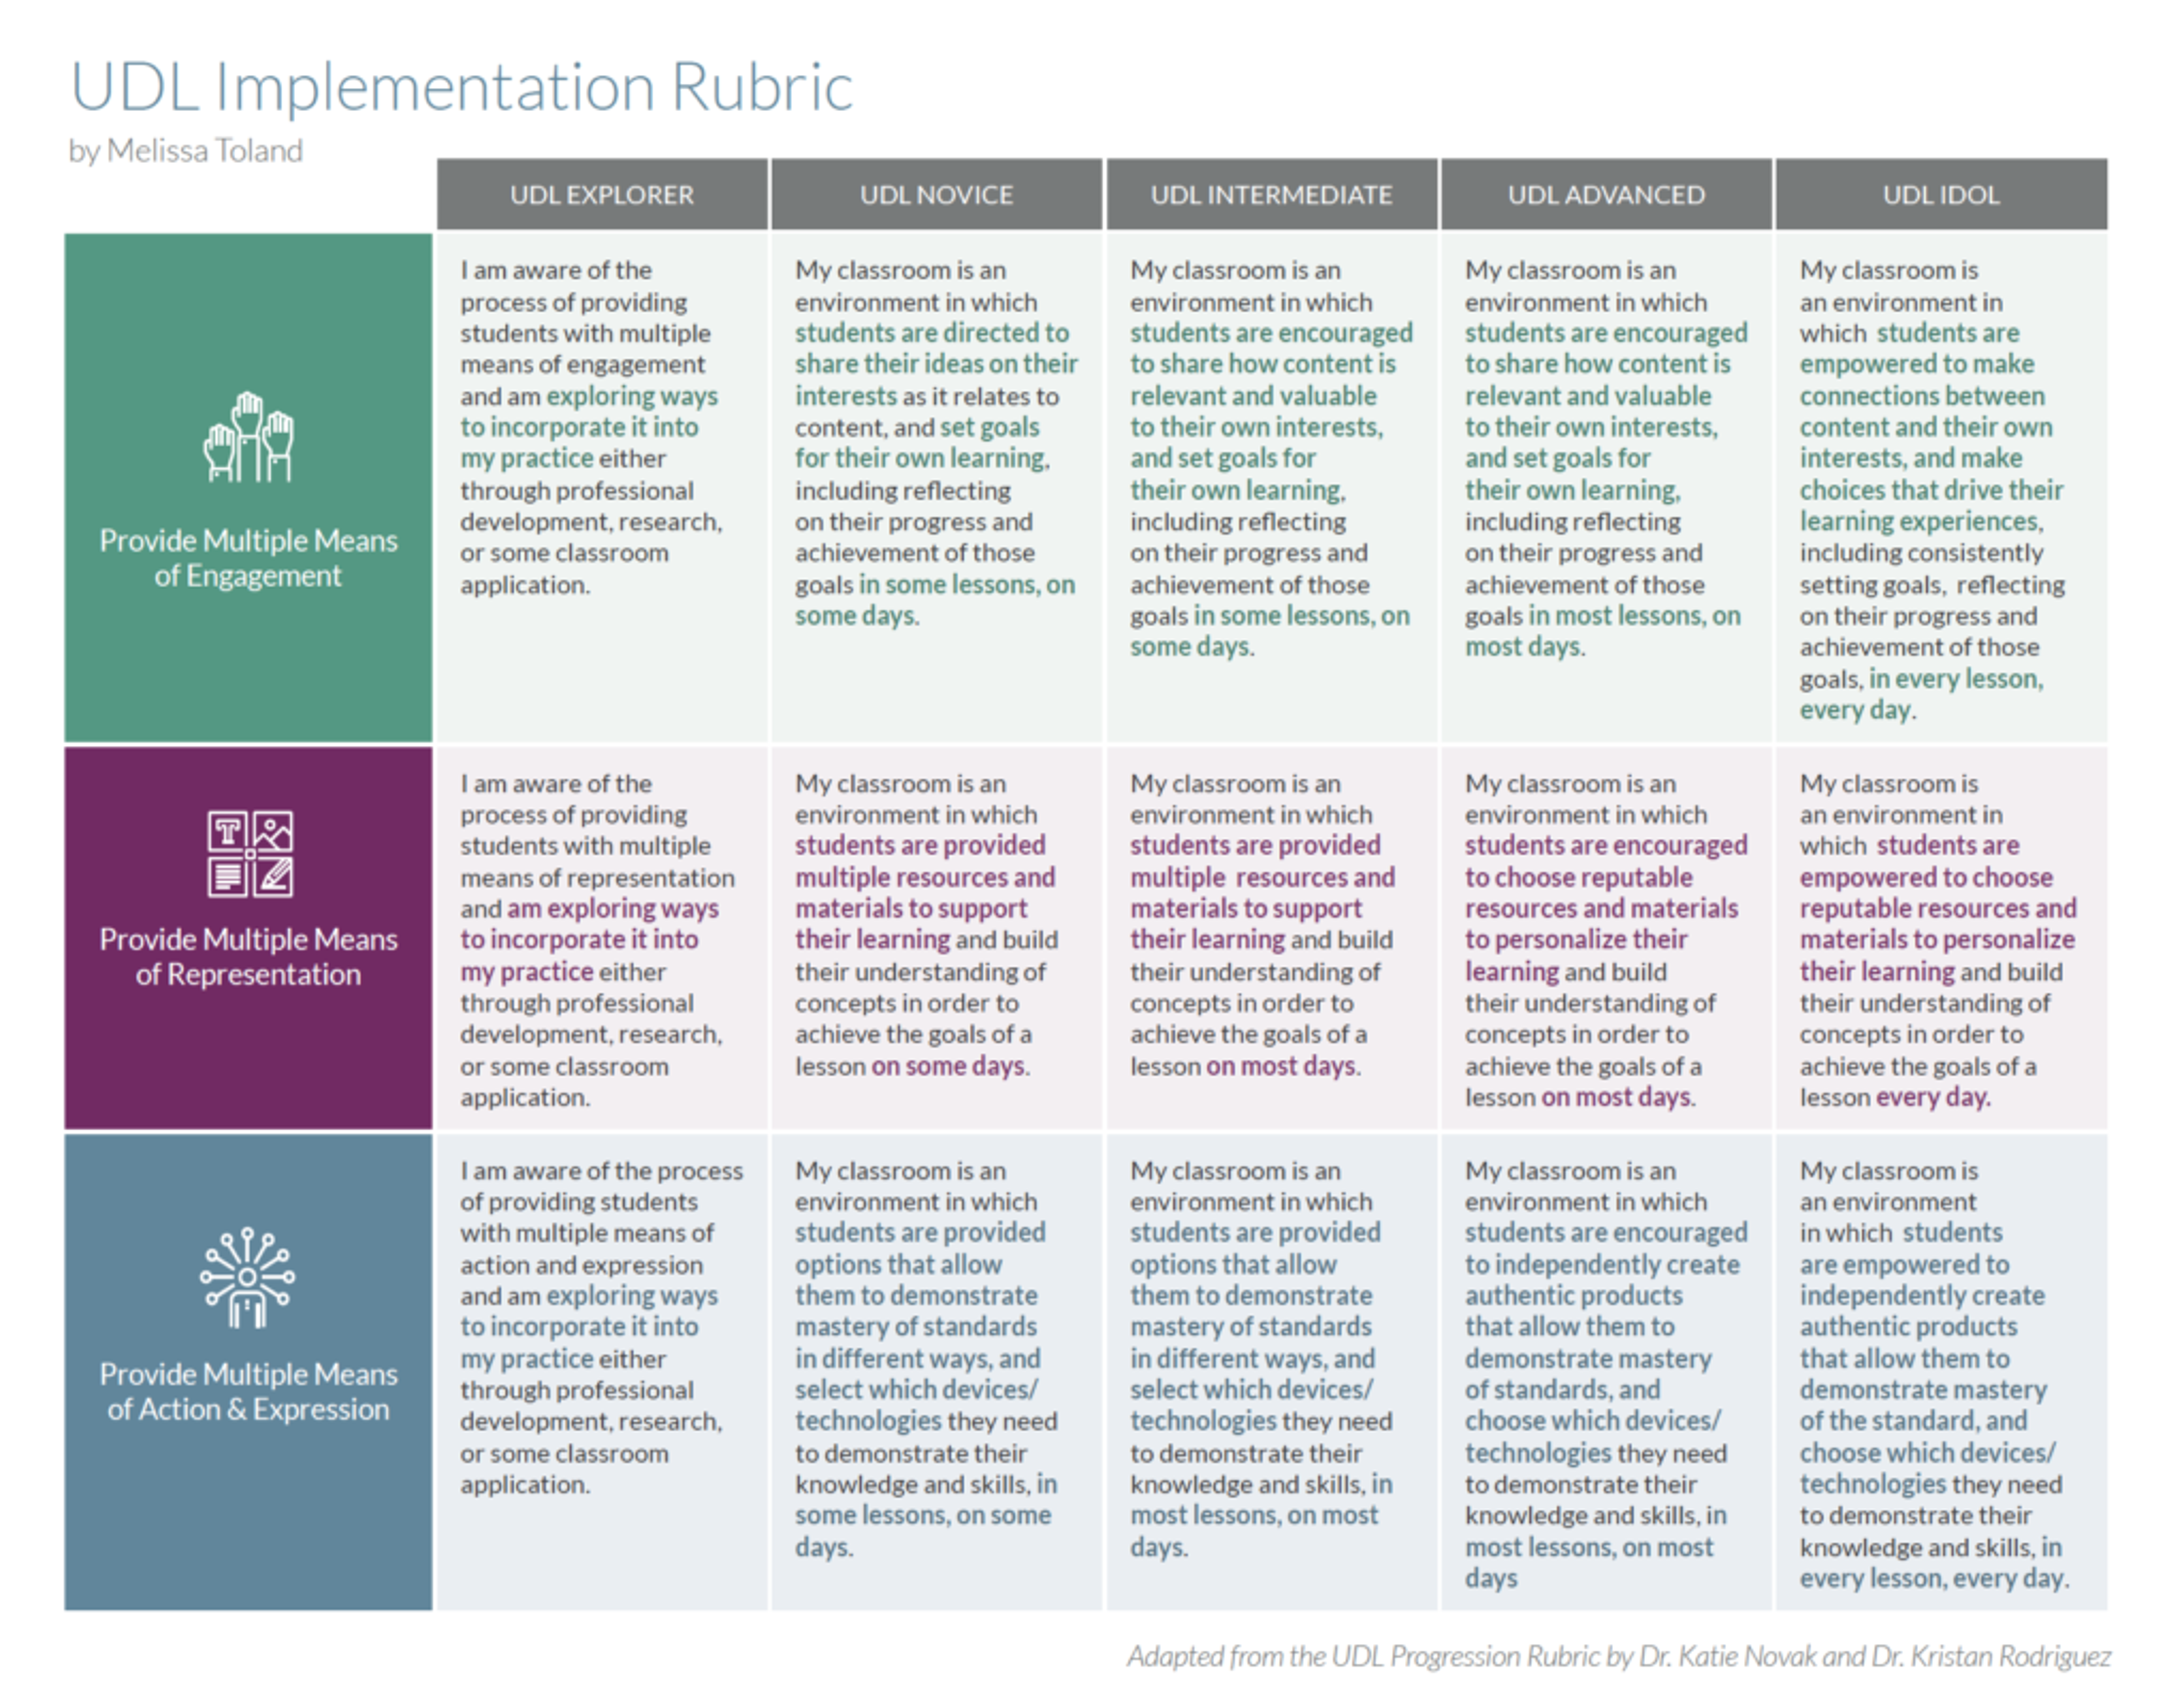 UDL Implementation Rubric by Melissa Toland